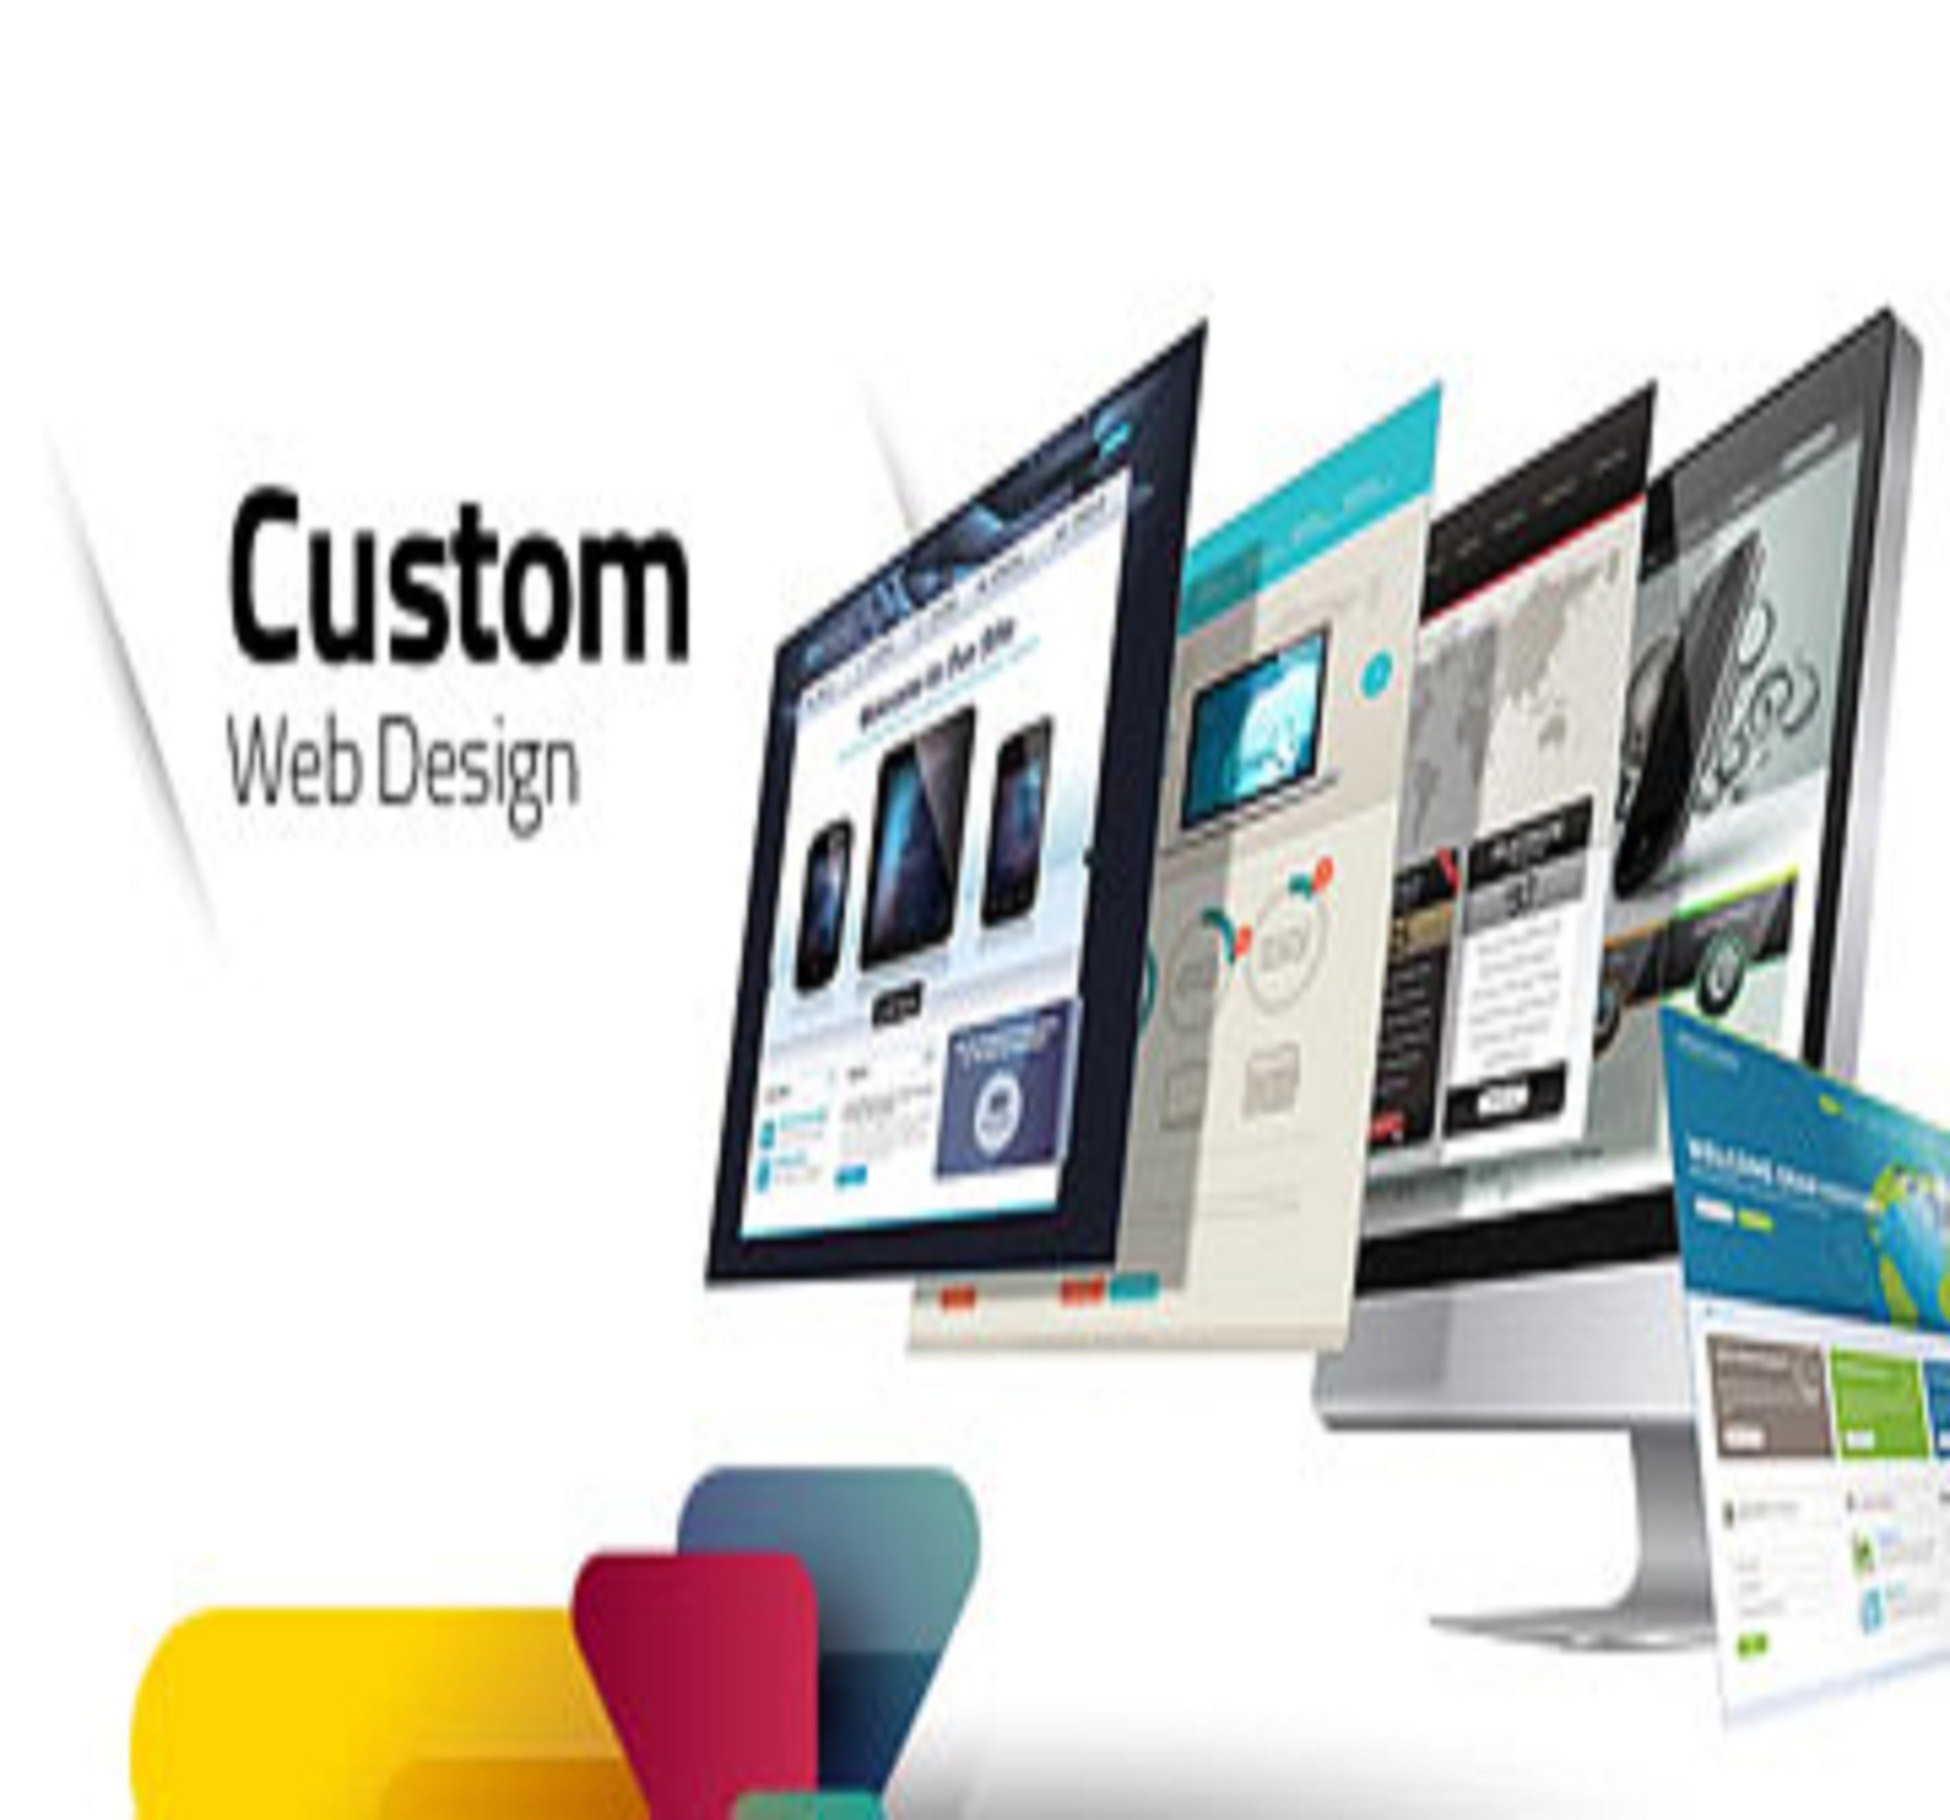 custom-web site design services